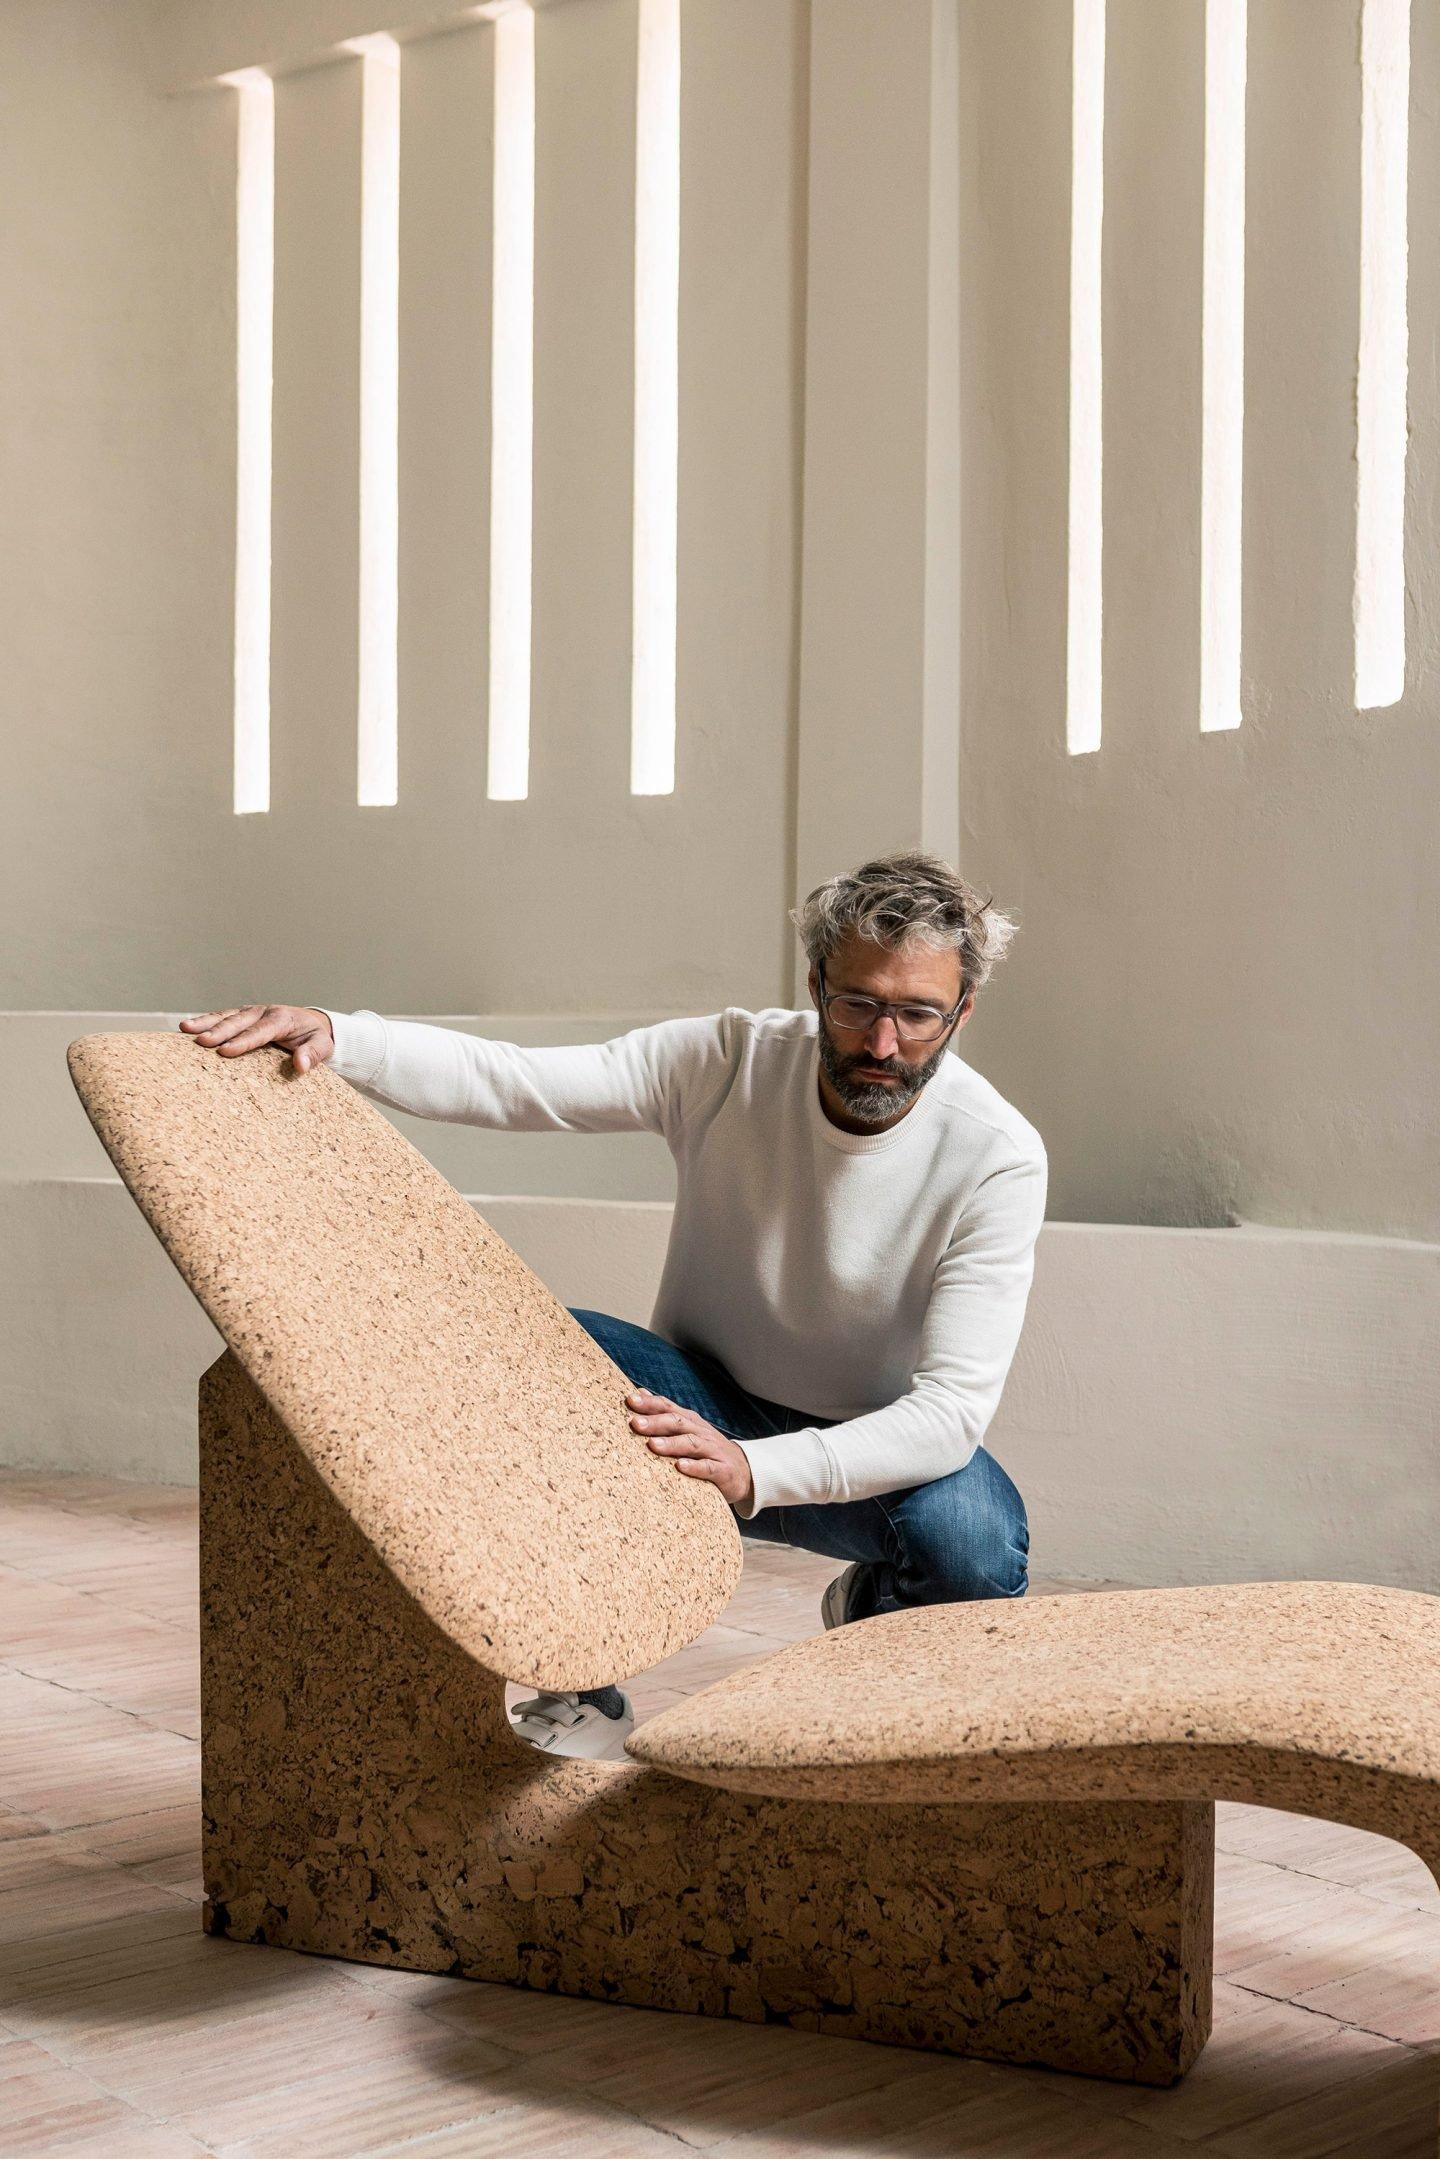 IGNANT-Design-Burnt-Cork-Noé-Duchaufour-4